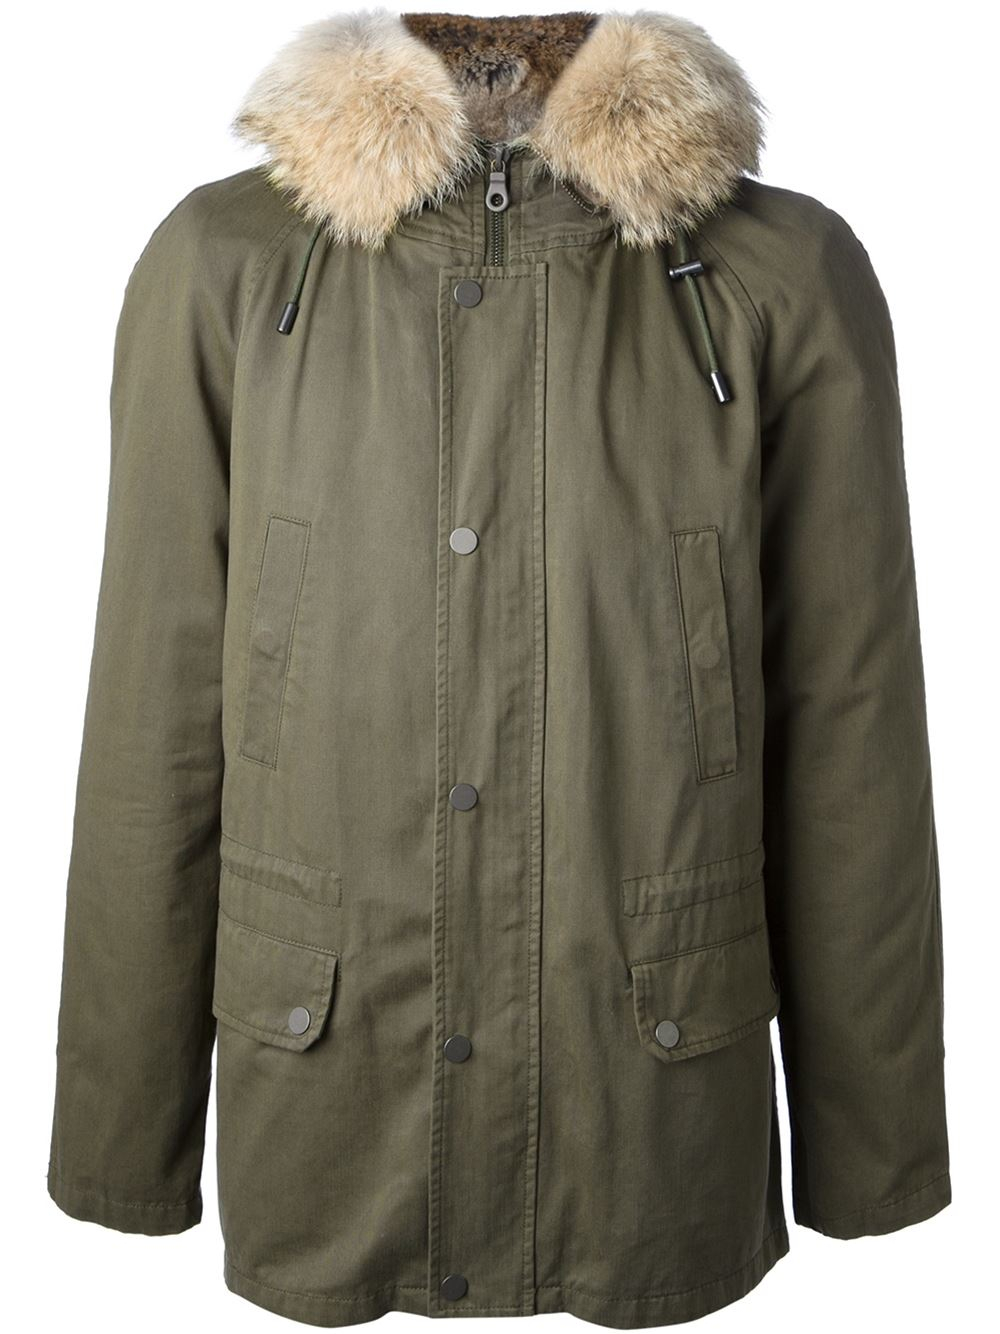 ff178c1dc09d Lyst - Yves Salomon Fur Lined Hooded Parka in Green for Men